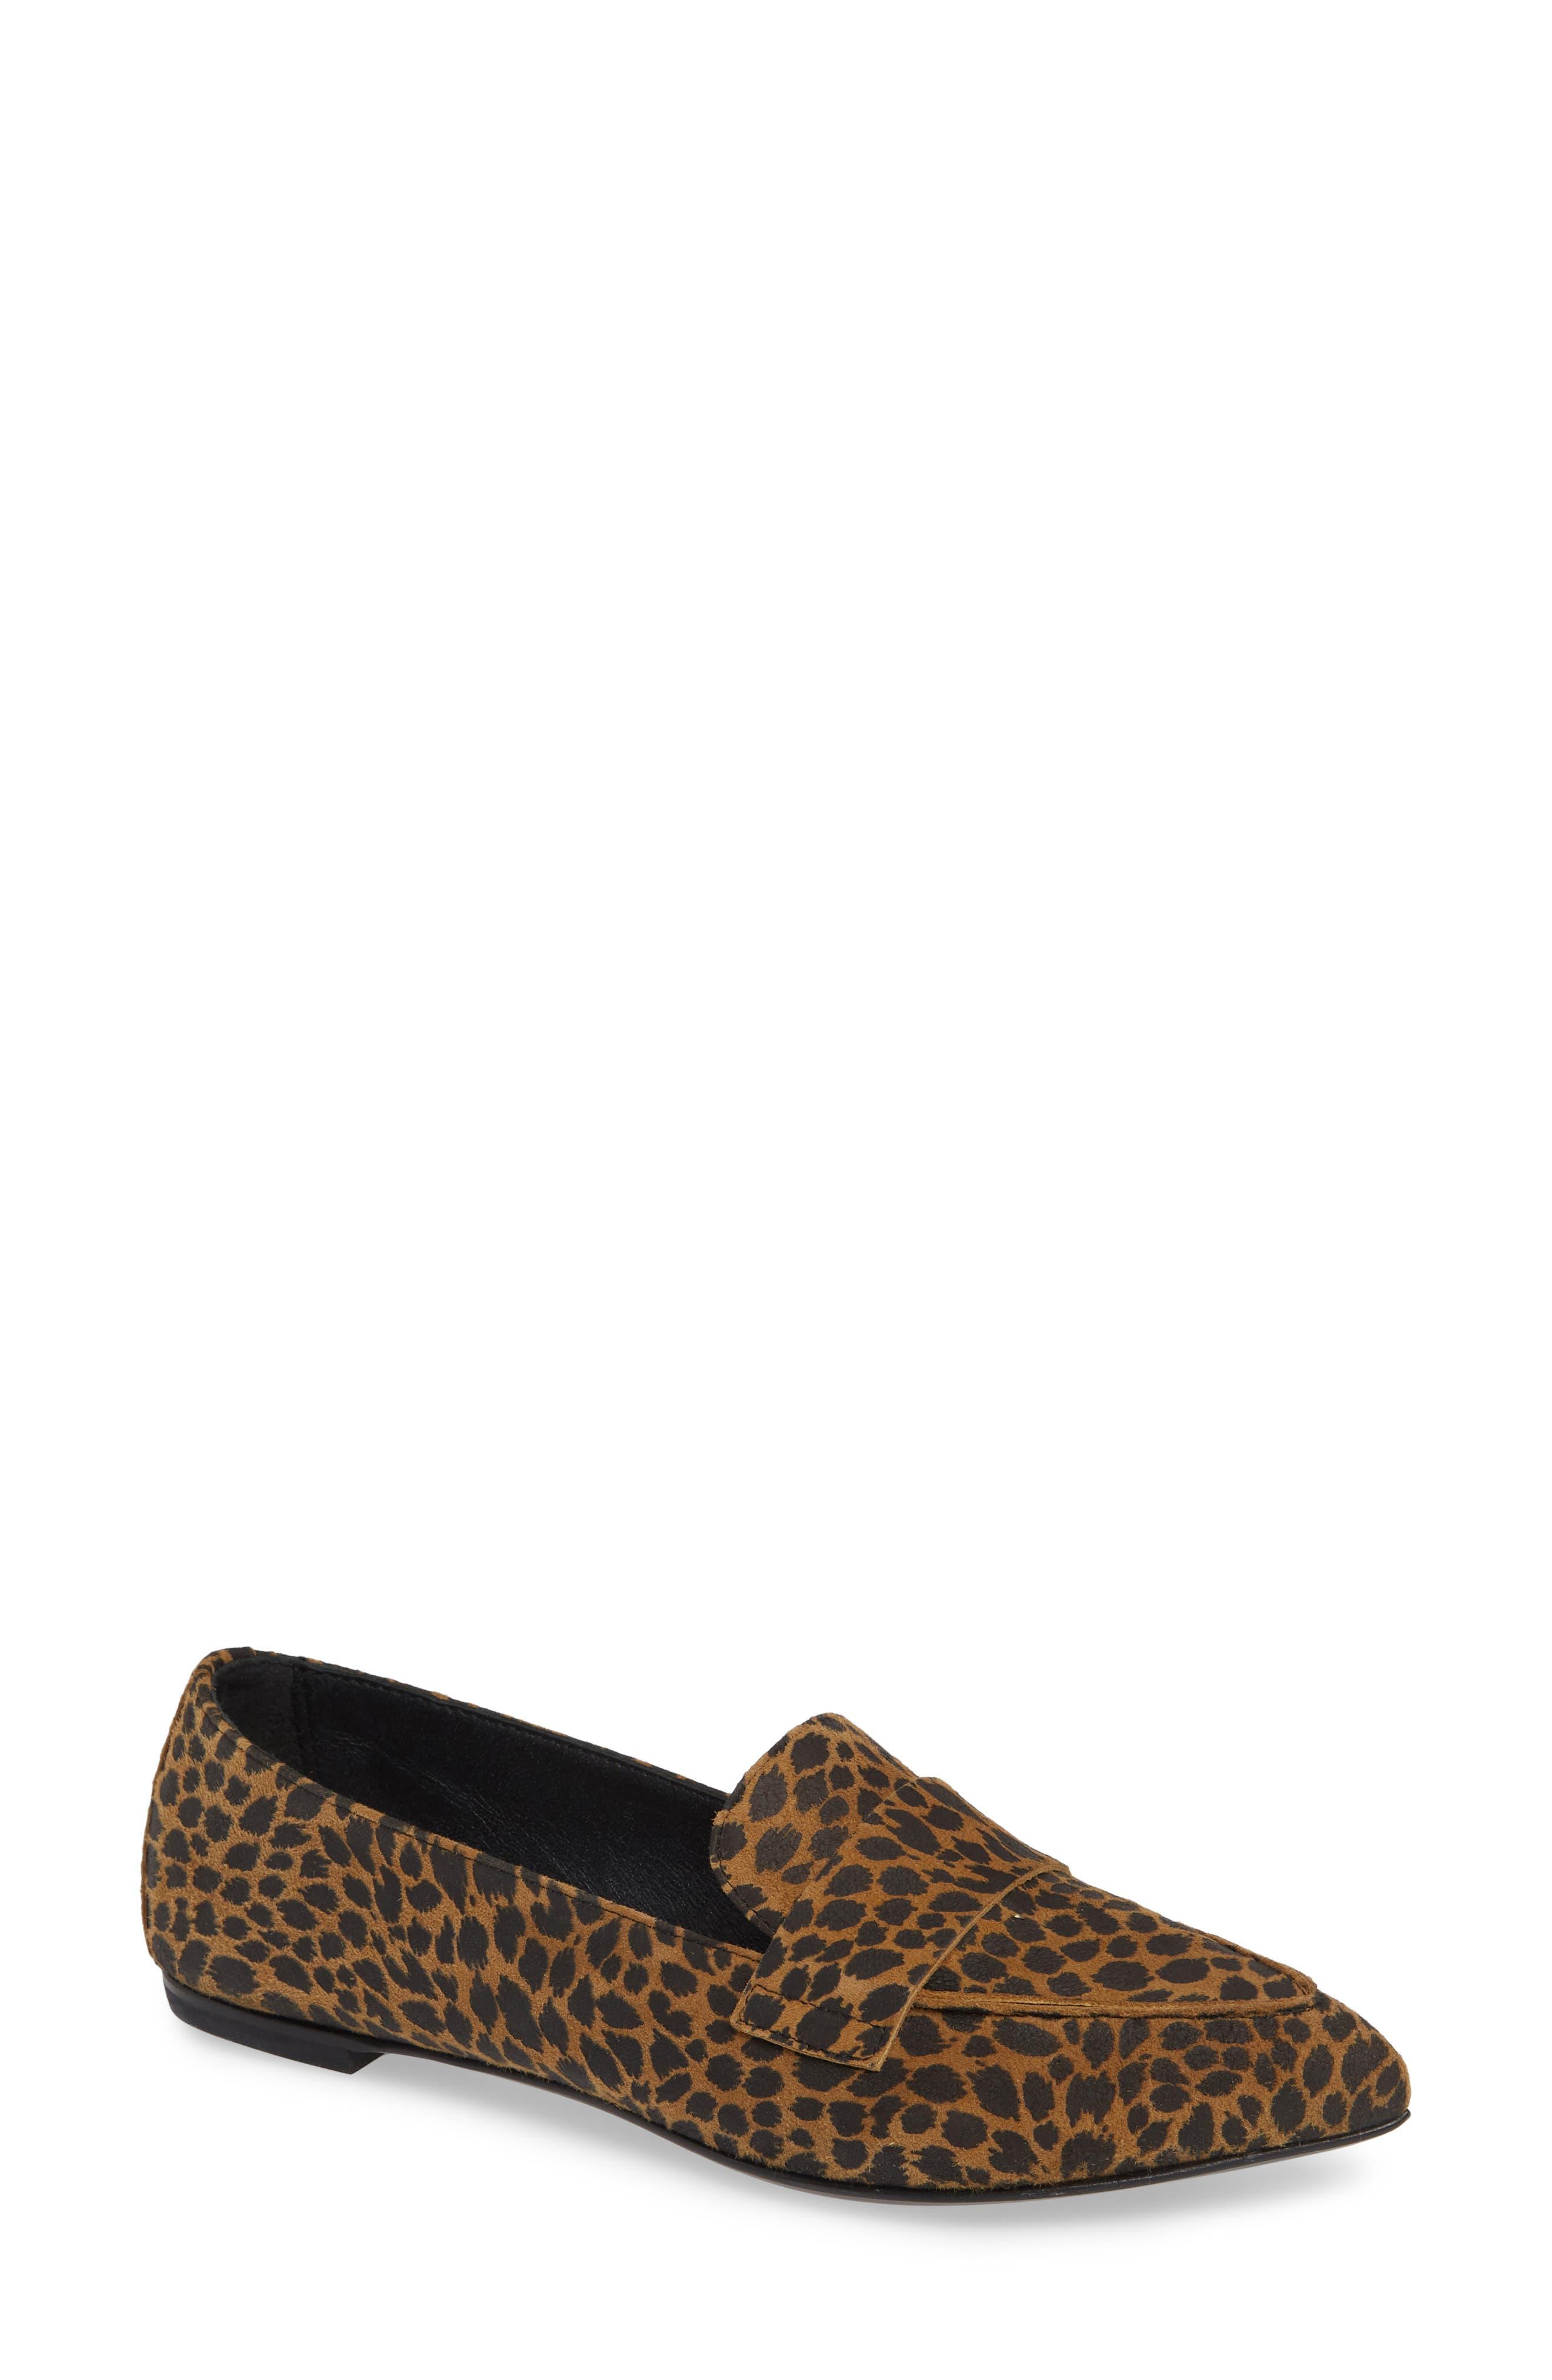 AGL ATTILIO GIUSTI LEOMBRUNI Softy Pointy Toe Moccasin Loafer in Leopard Leather